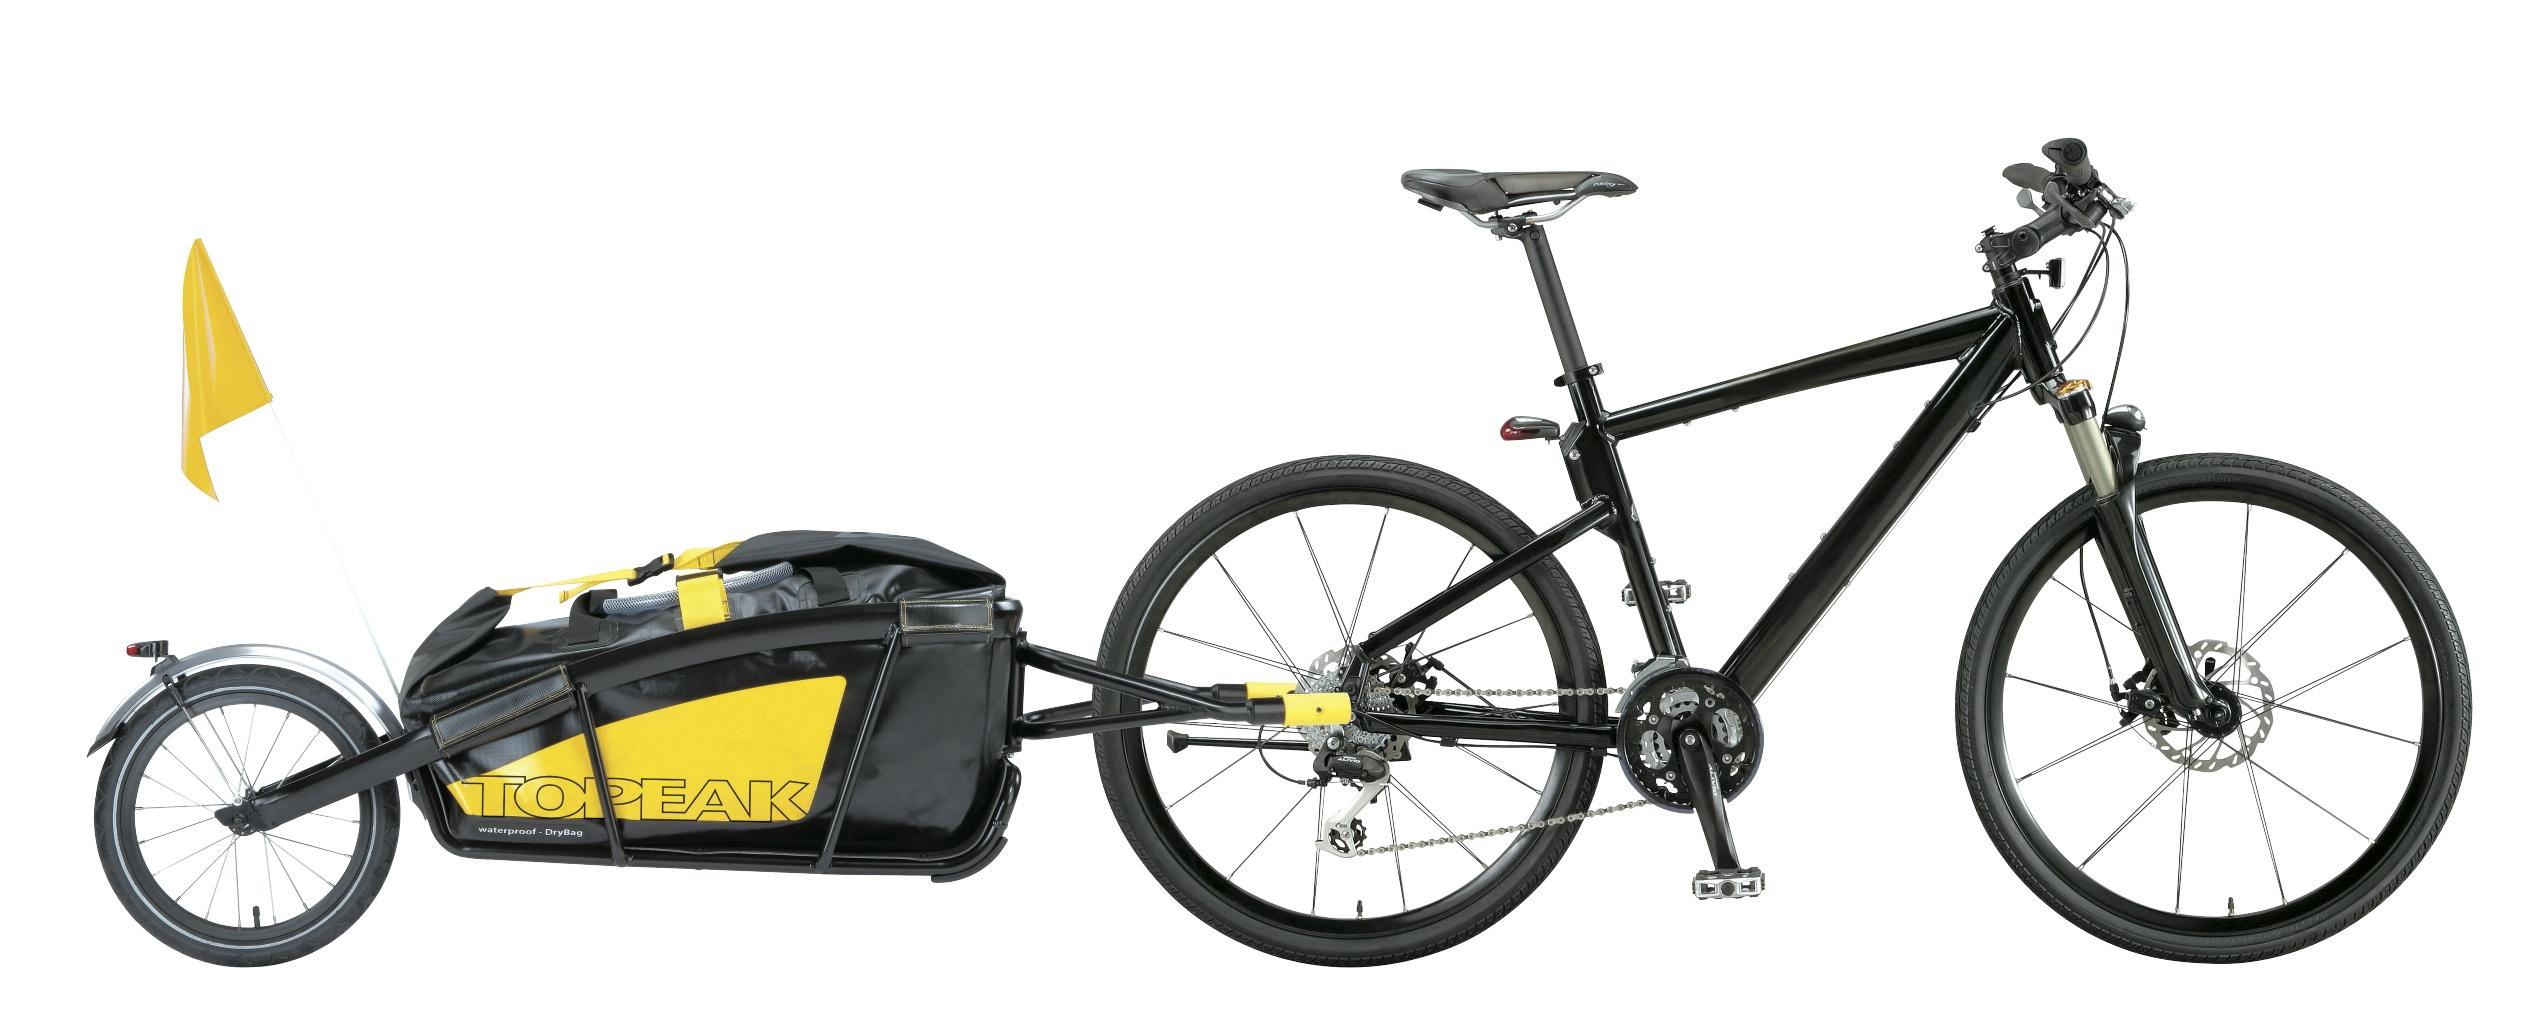 Ejemplo de remolque para bicicleta